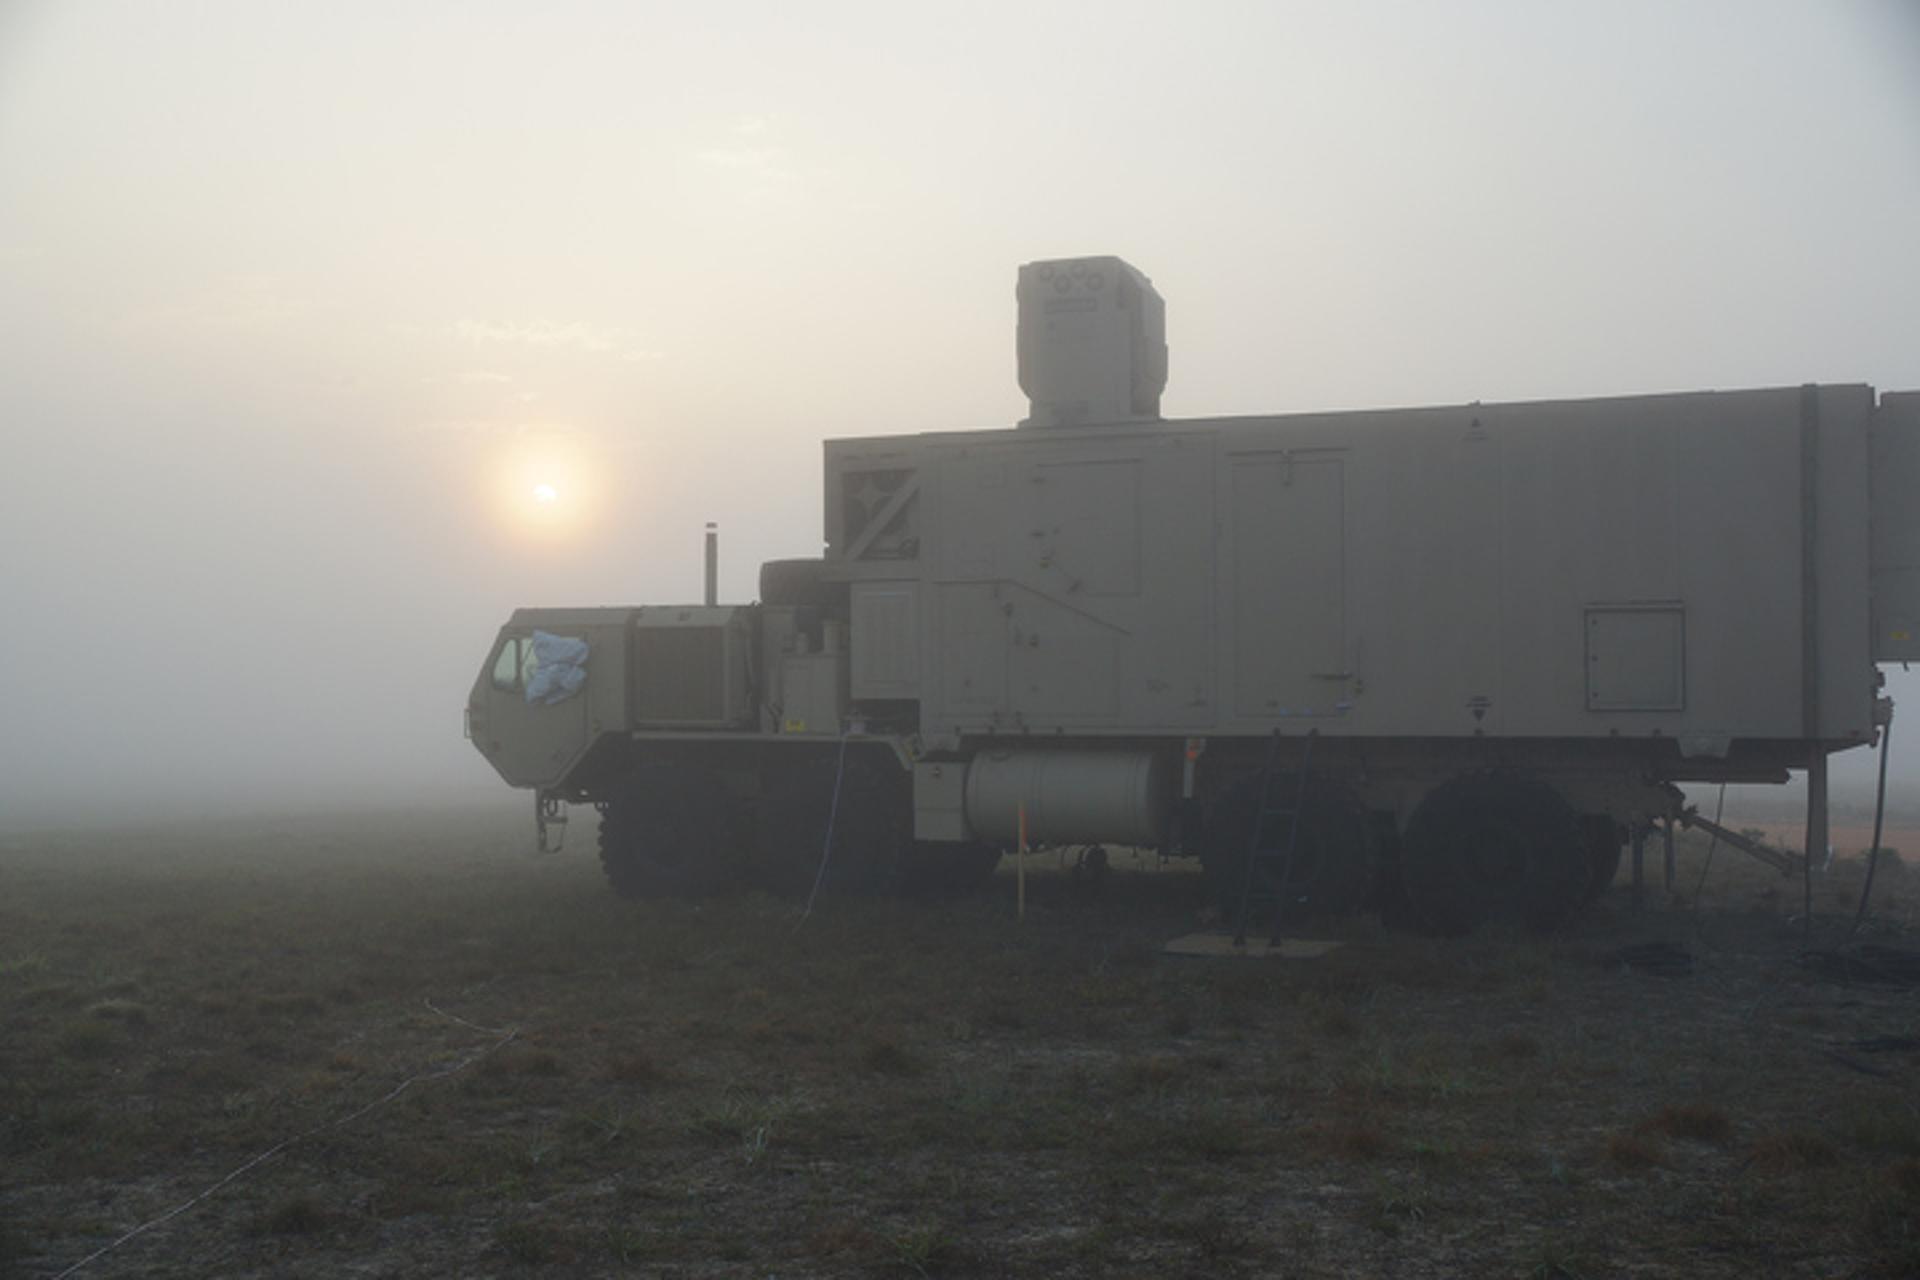 Boeing's New Laser Decimates Drones Even in Foggy Conditions